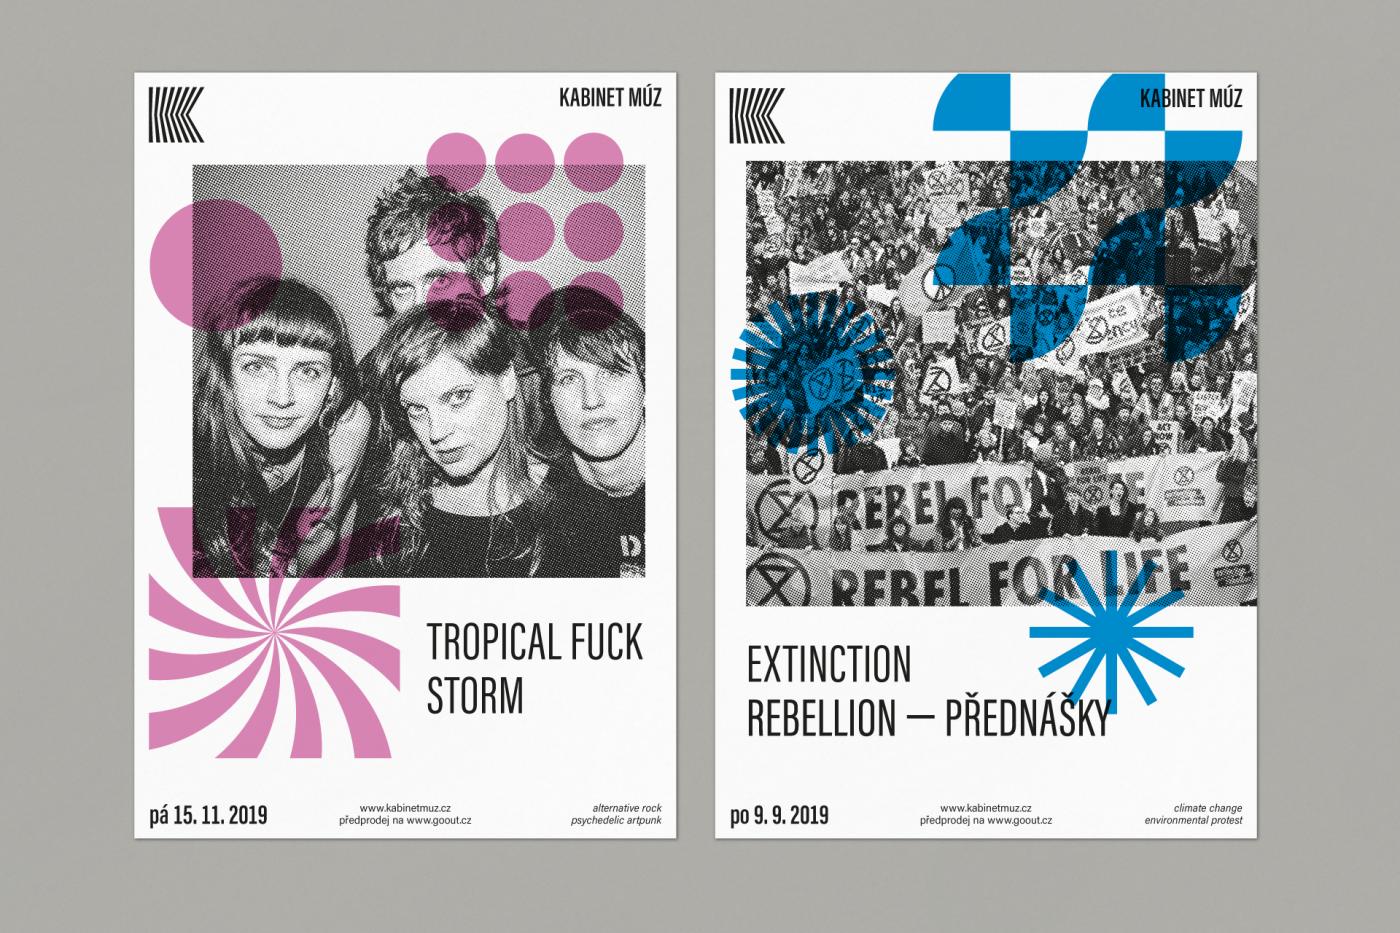 Kabinet Můz event posters